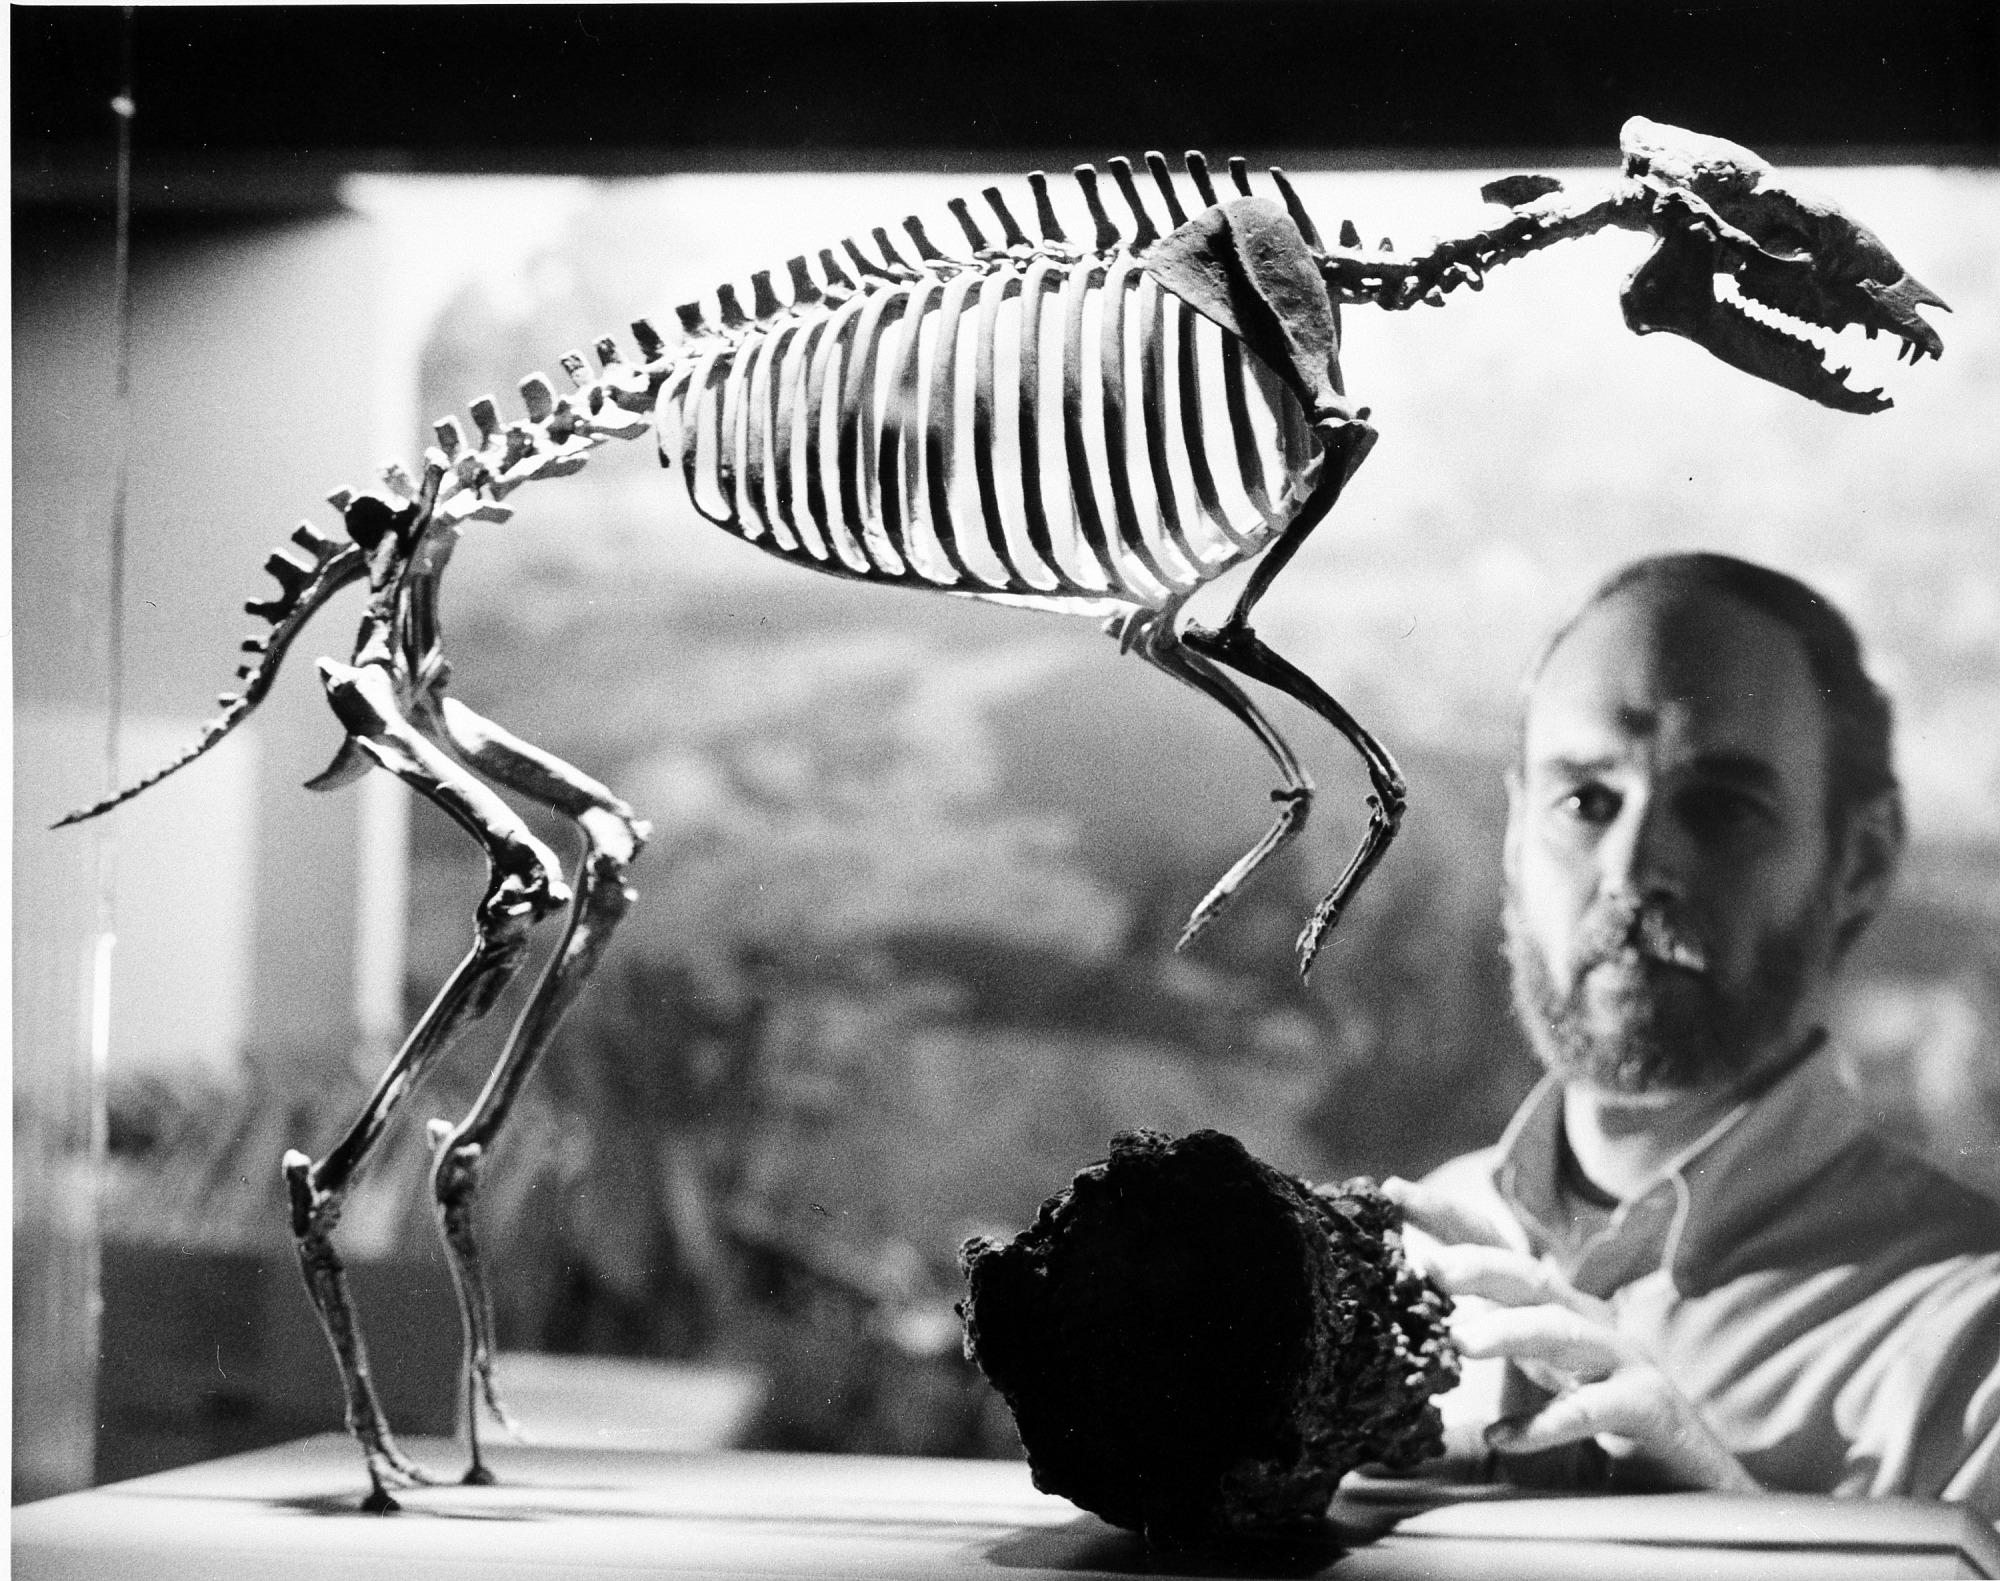 Robert J. Emry and Hyracotherium Skeleton